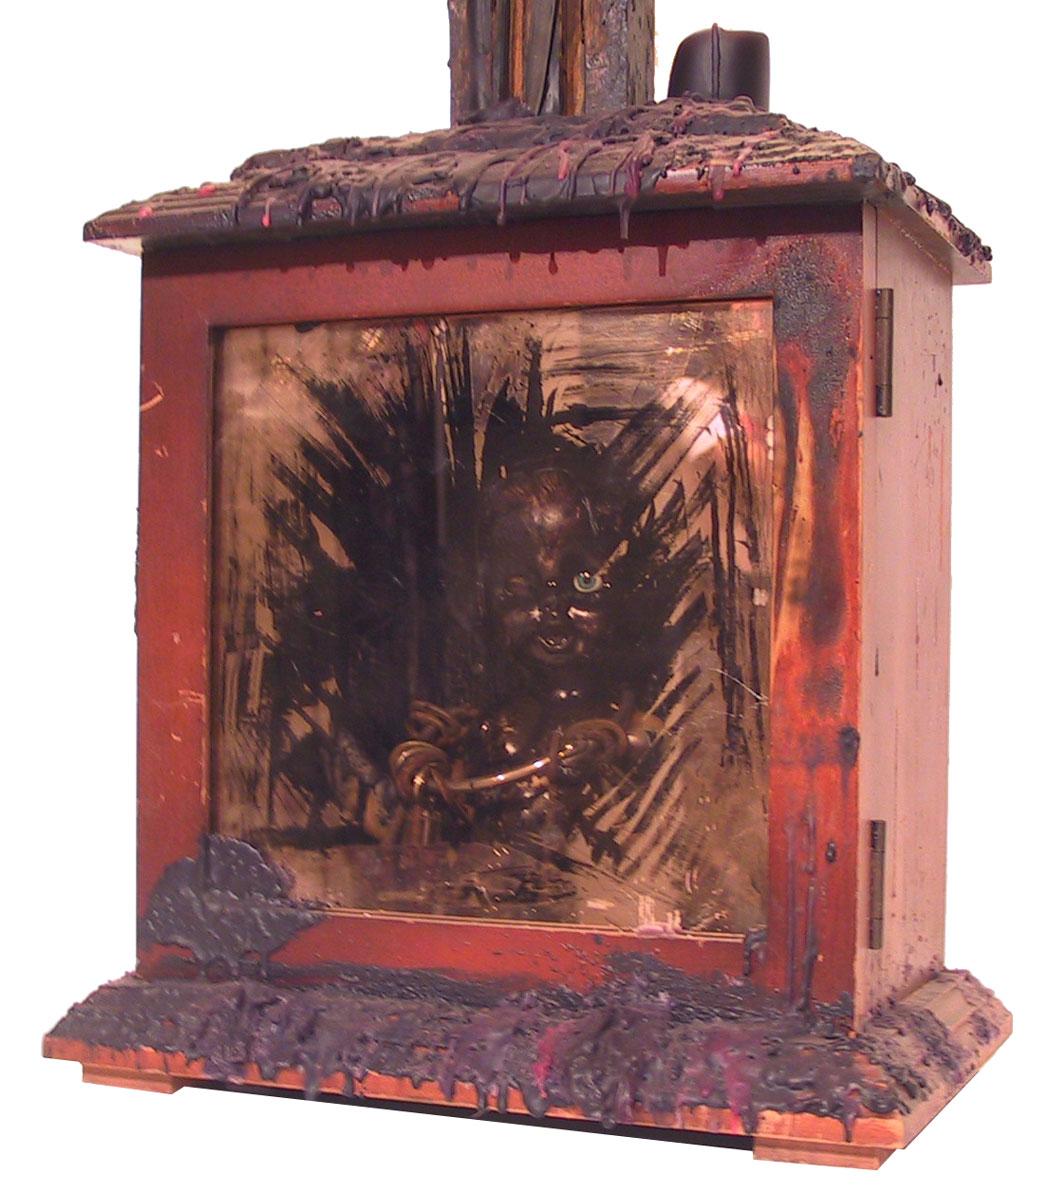 Bizango Altar, 2000